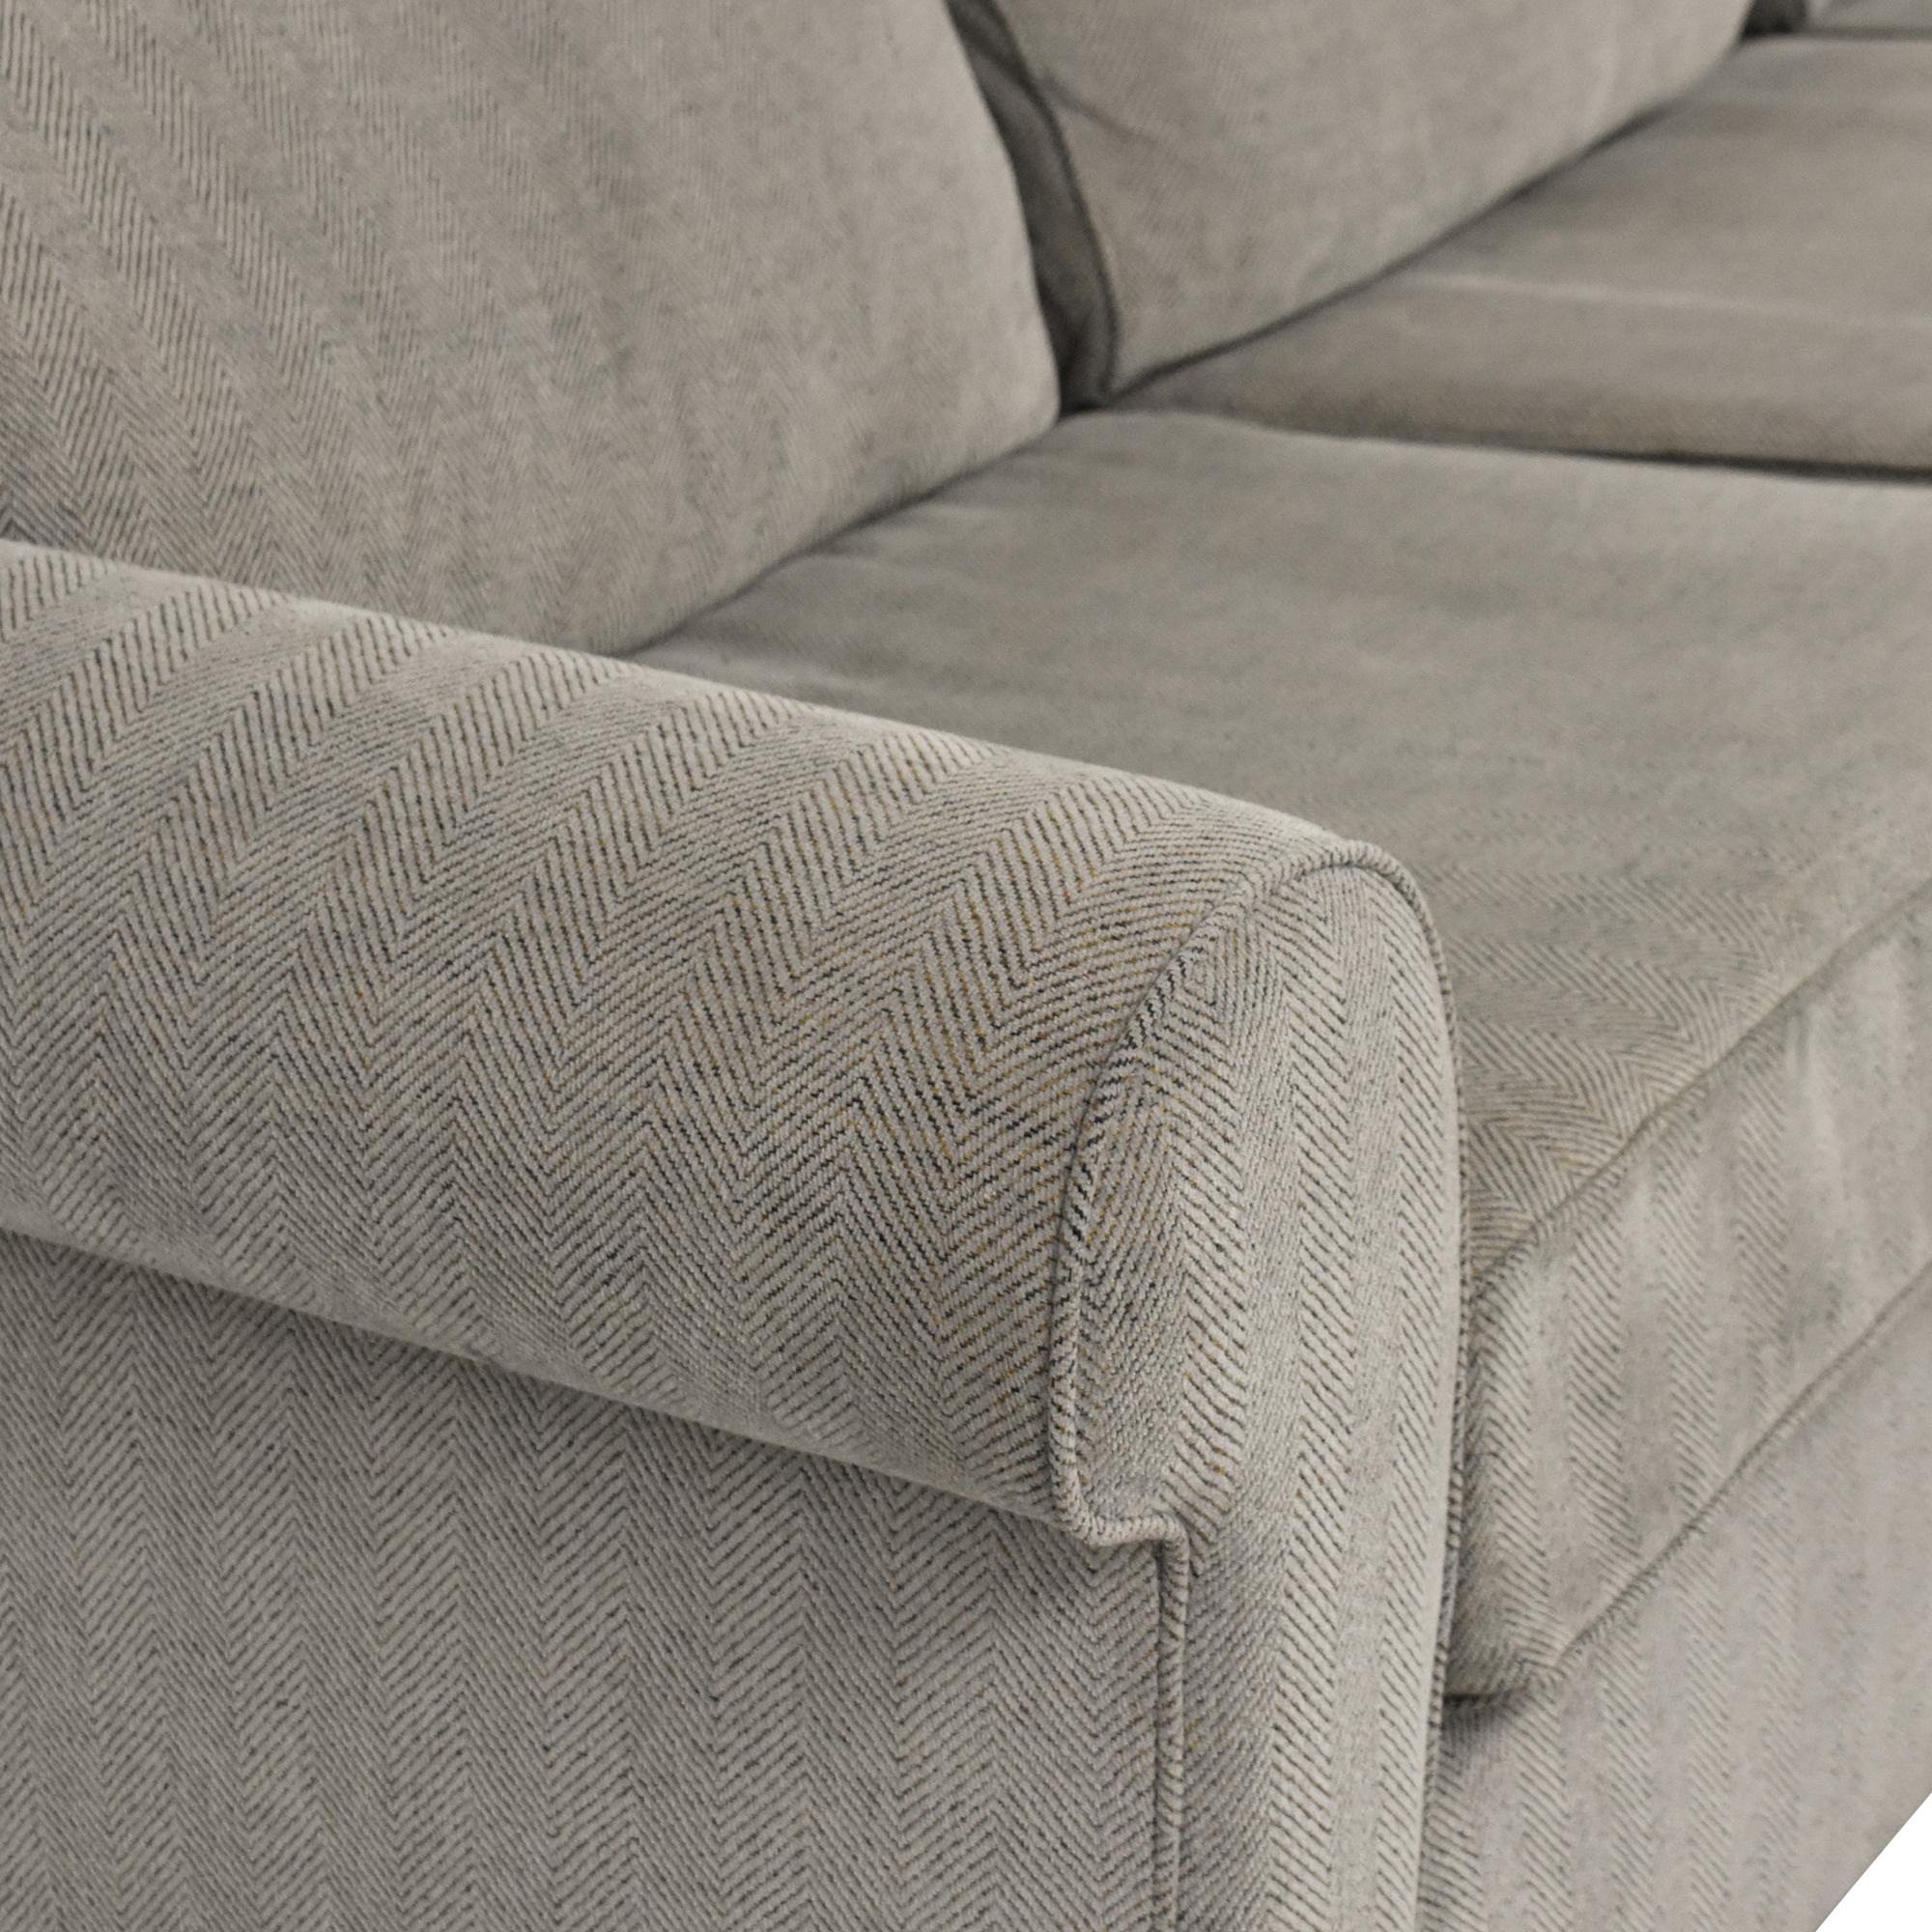 Raymour & Flanigan Raymour & Flanigan Kipling Two Piece Sectional Sofa Sofas